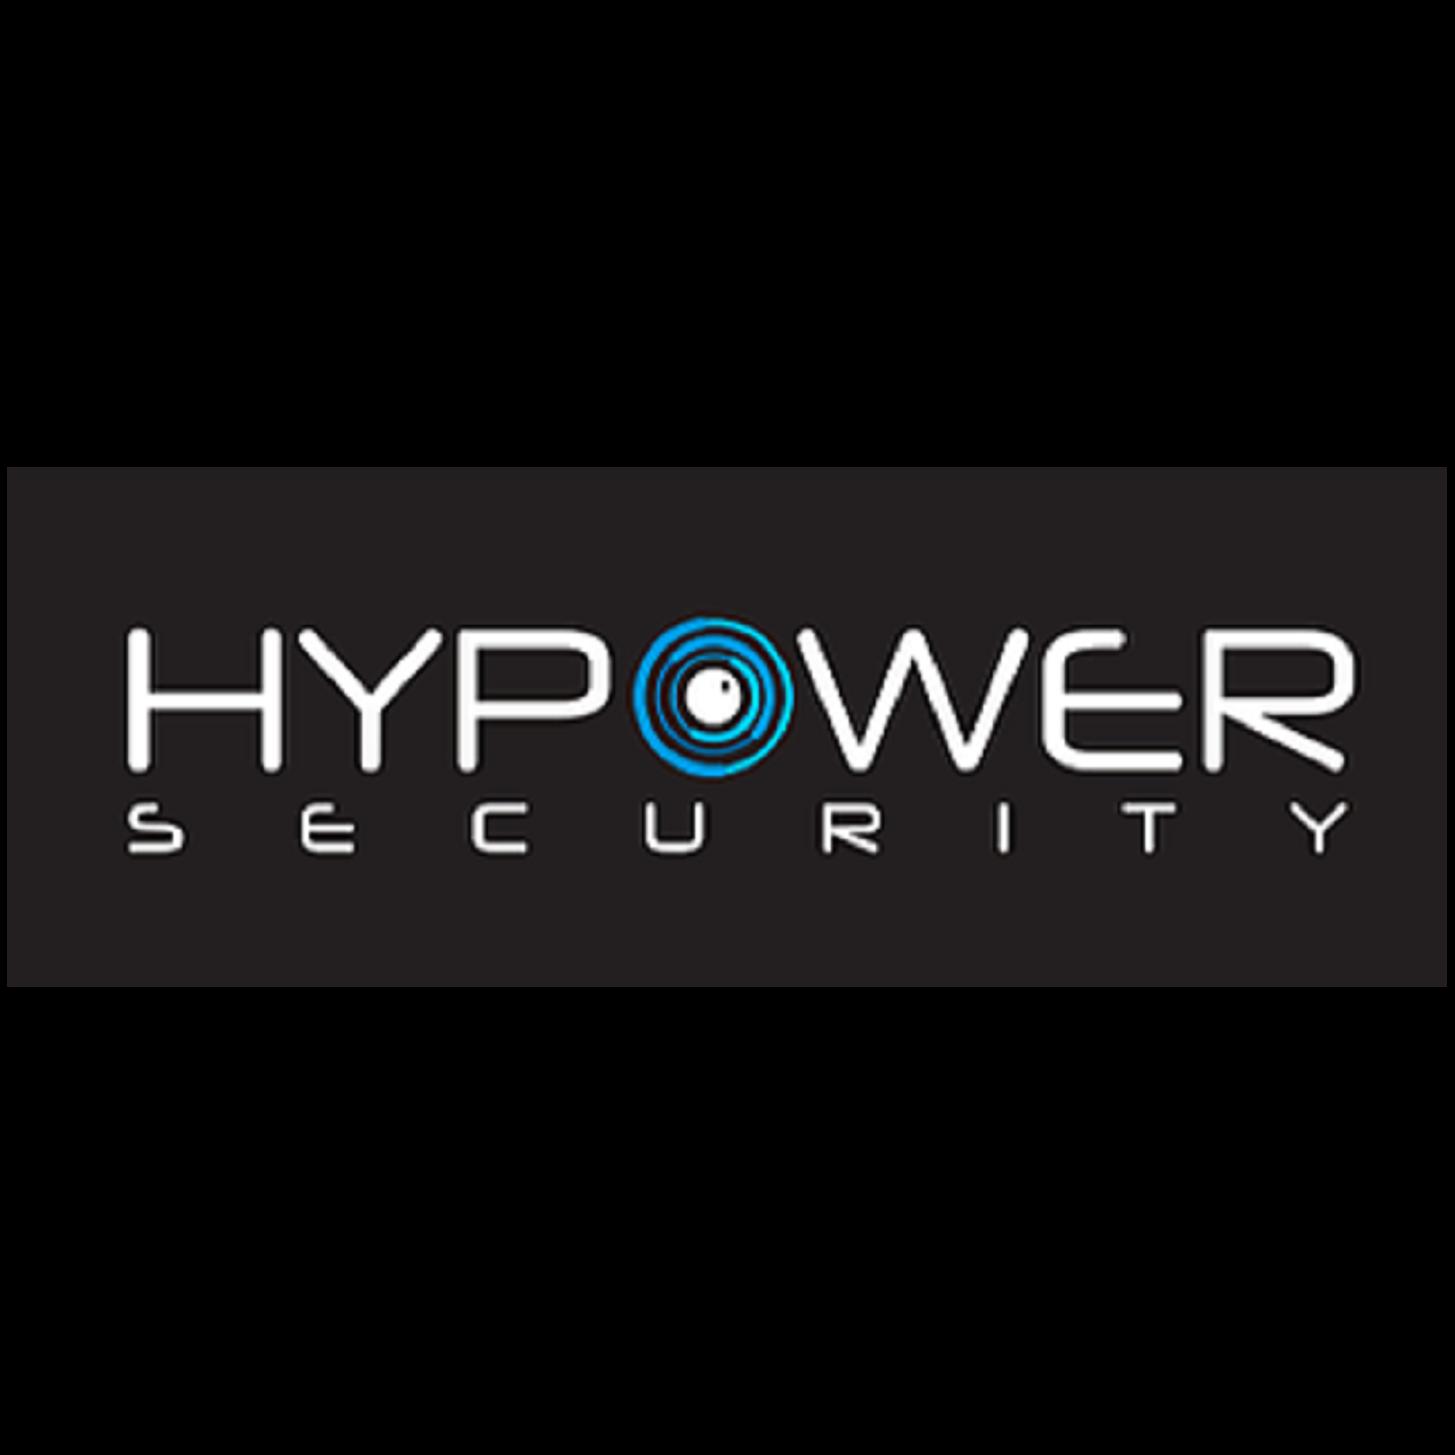 Hypower Security